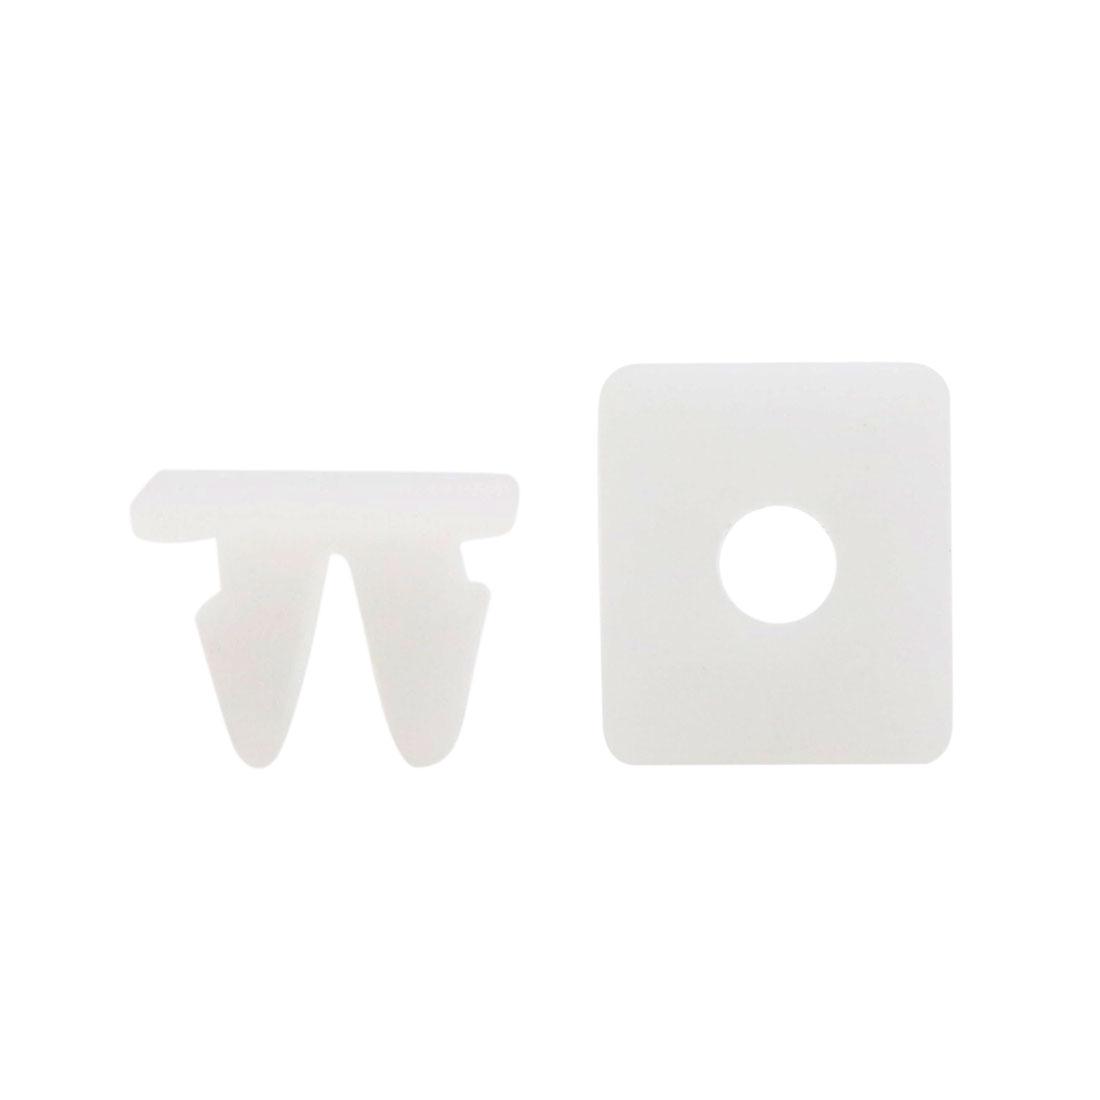 20 Pcs White Plastic Rivet Trim Fastener Moulding Clips for 10mm x 10mm Dia Hole